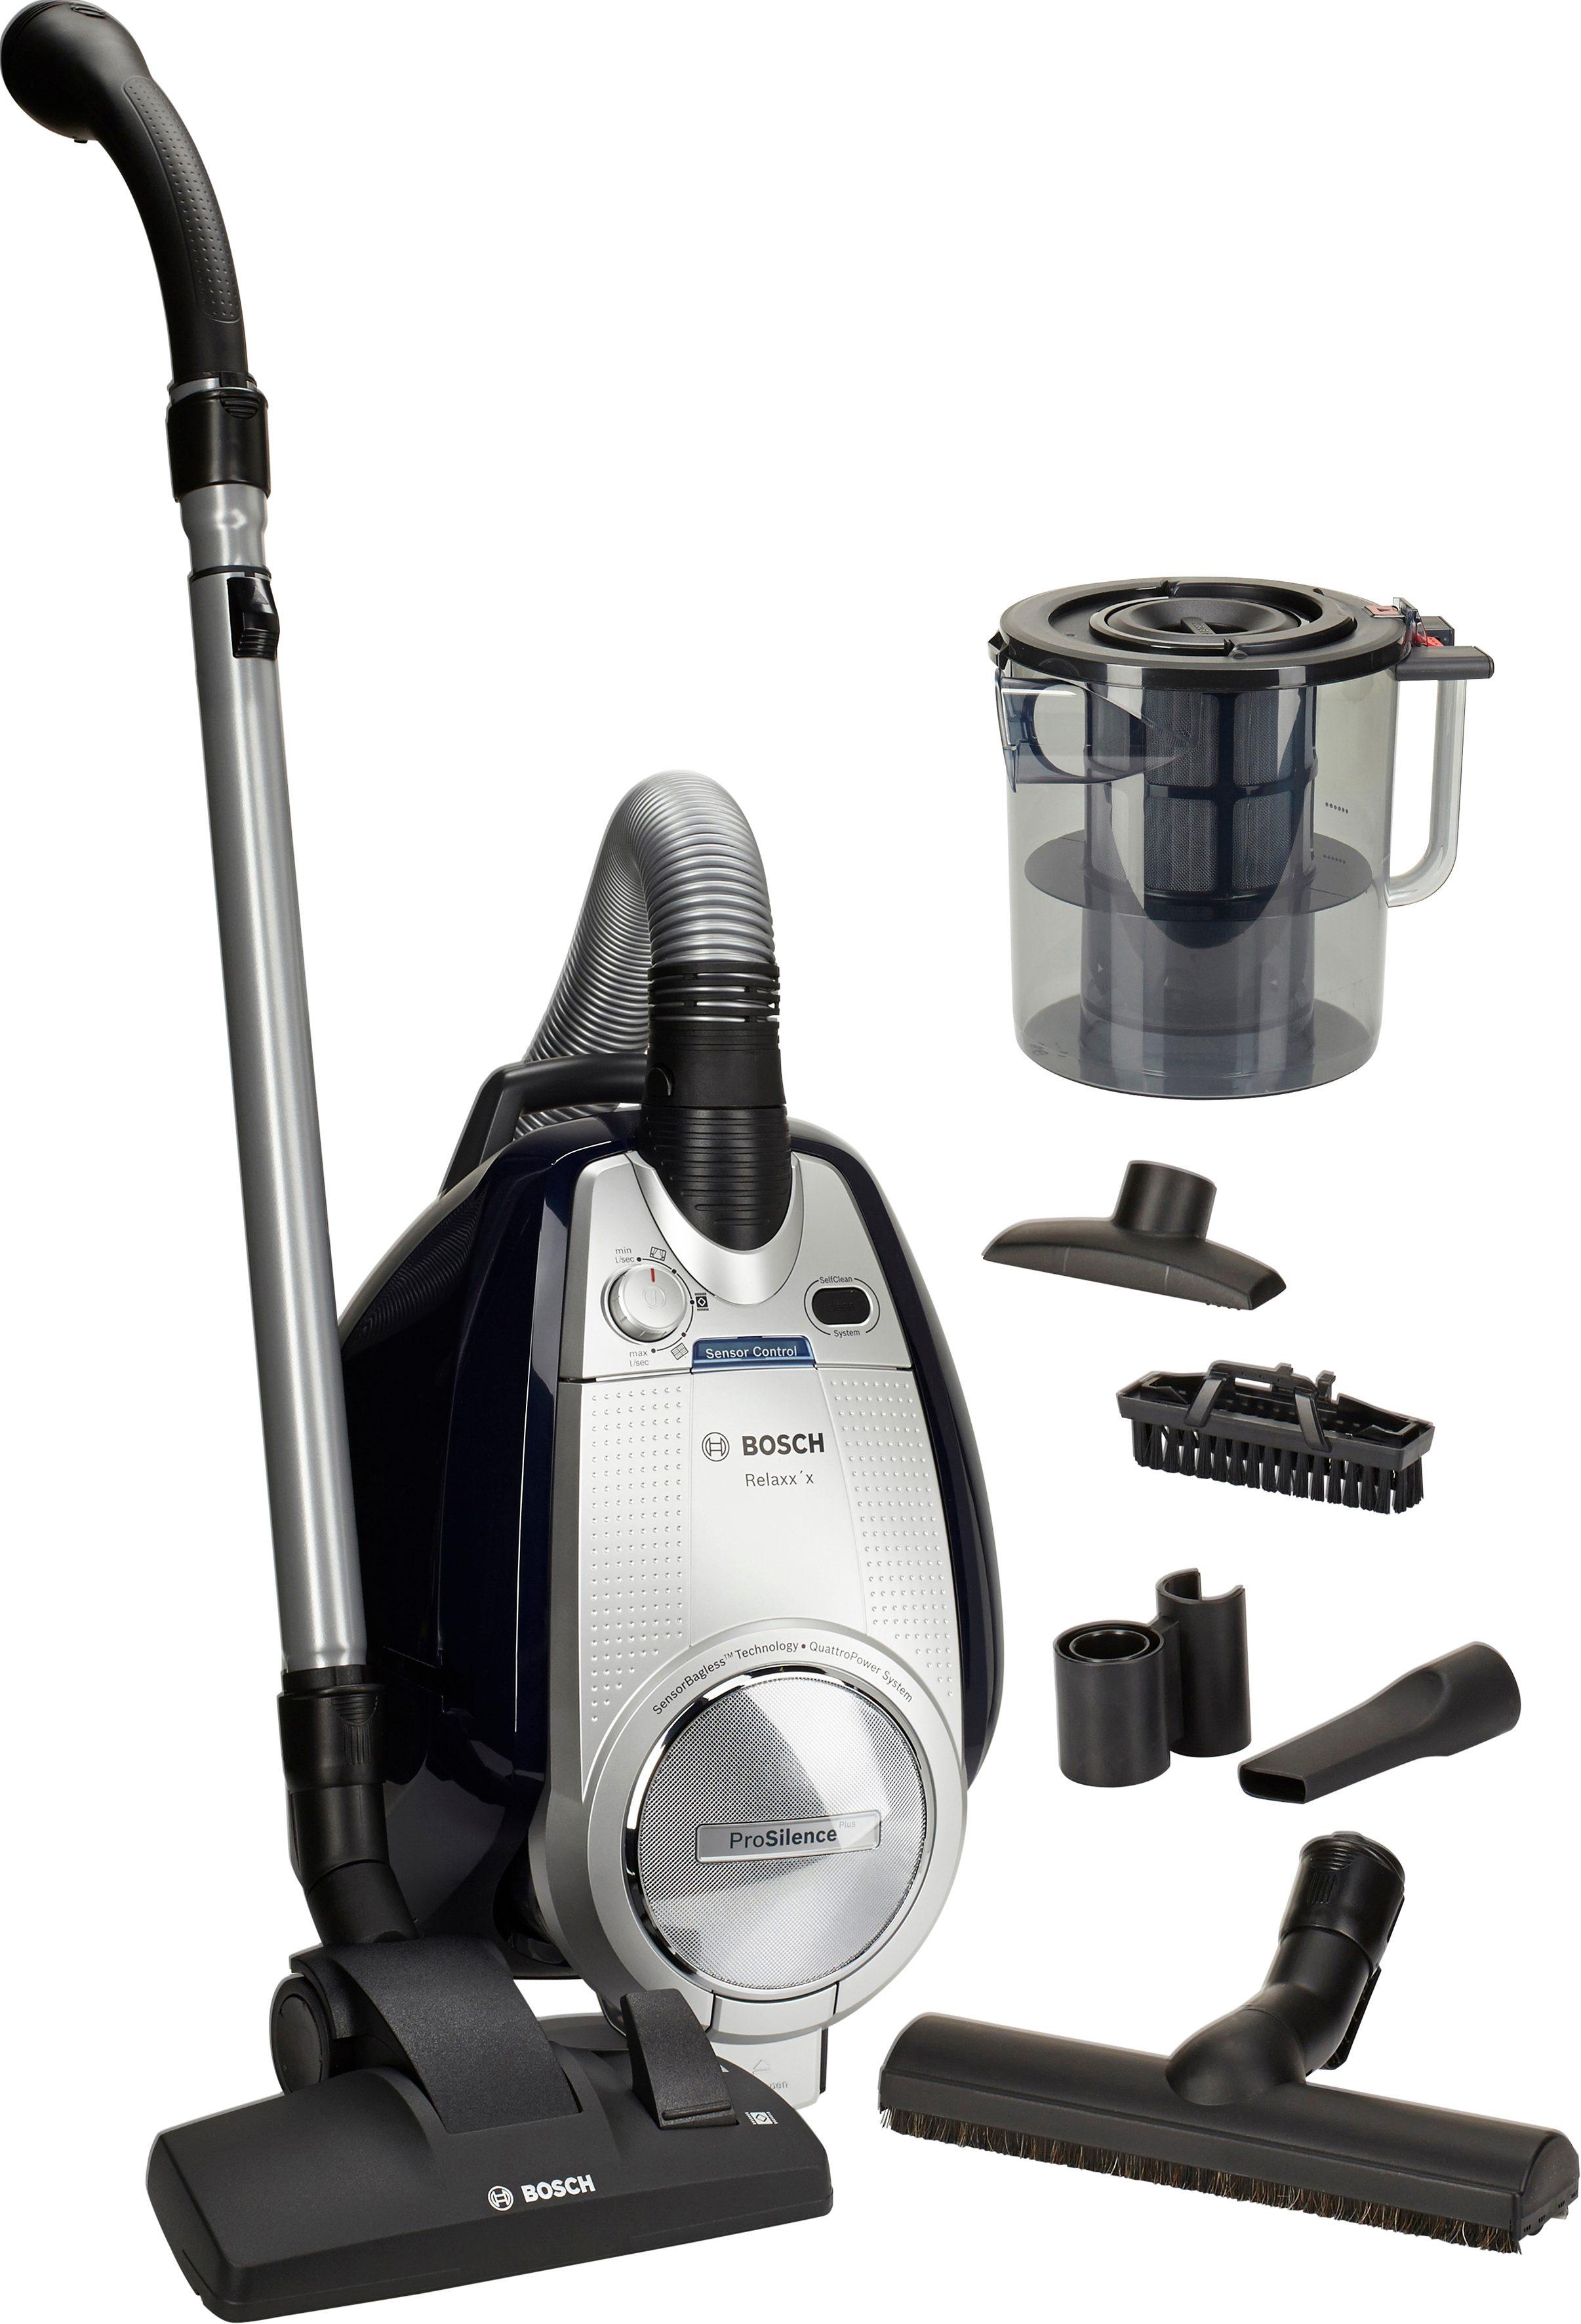 Bosch Bodenstaubsauger Relaxx'x ProSilence Plus BGS5330A, beutellos, Energieeffizienzklasse B